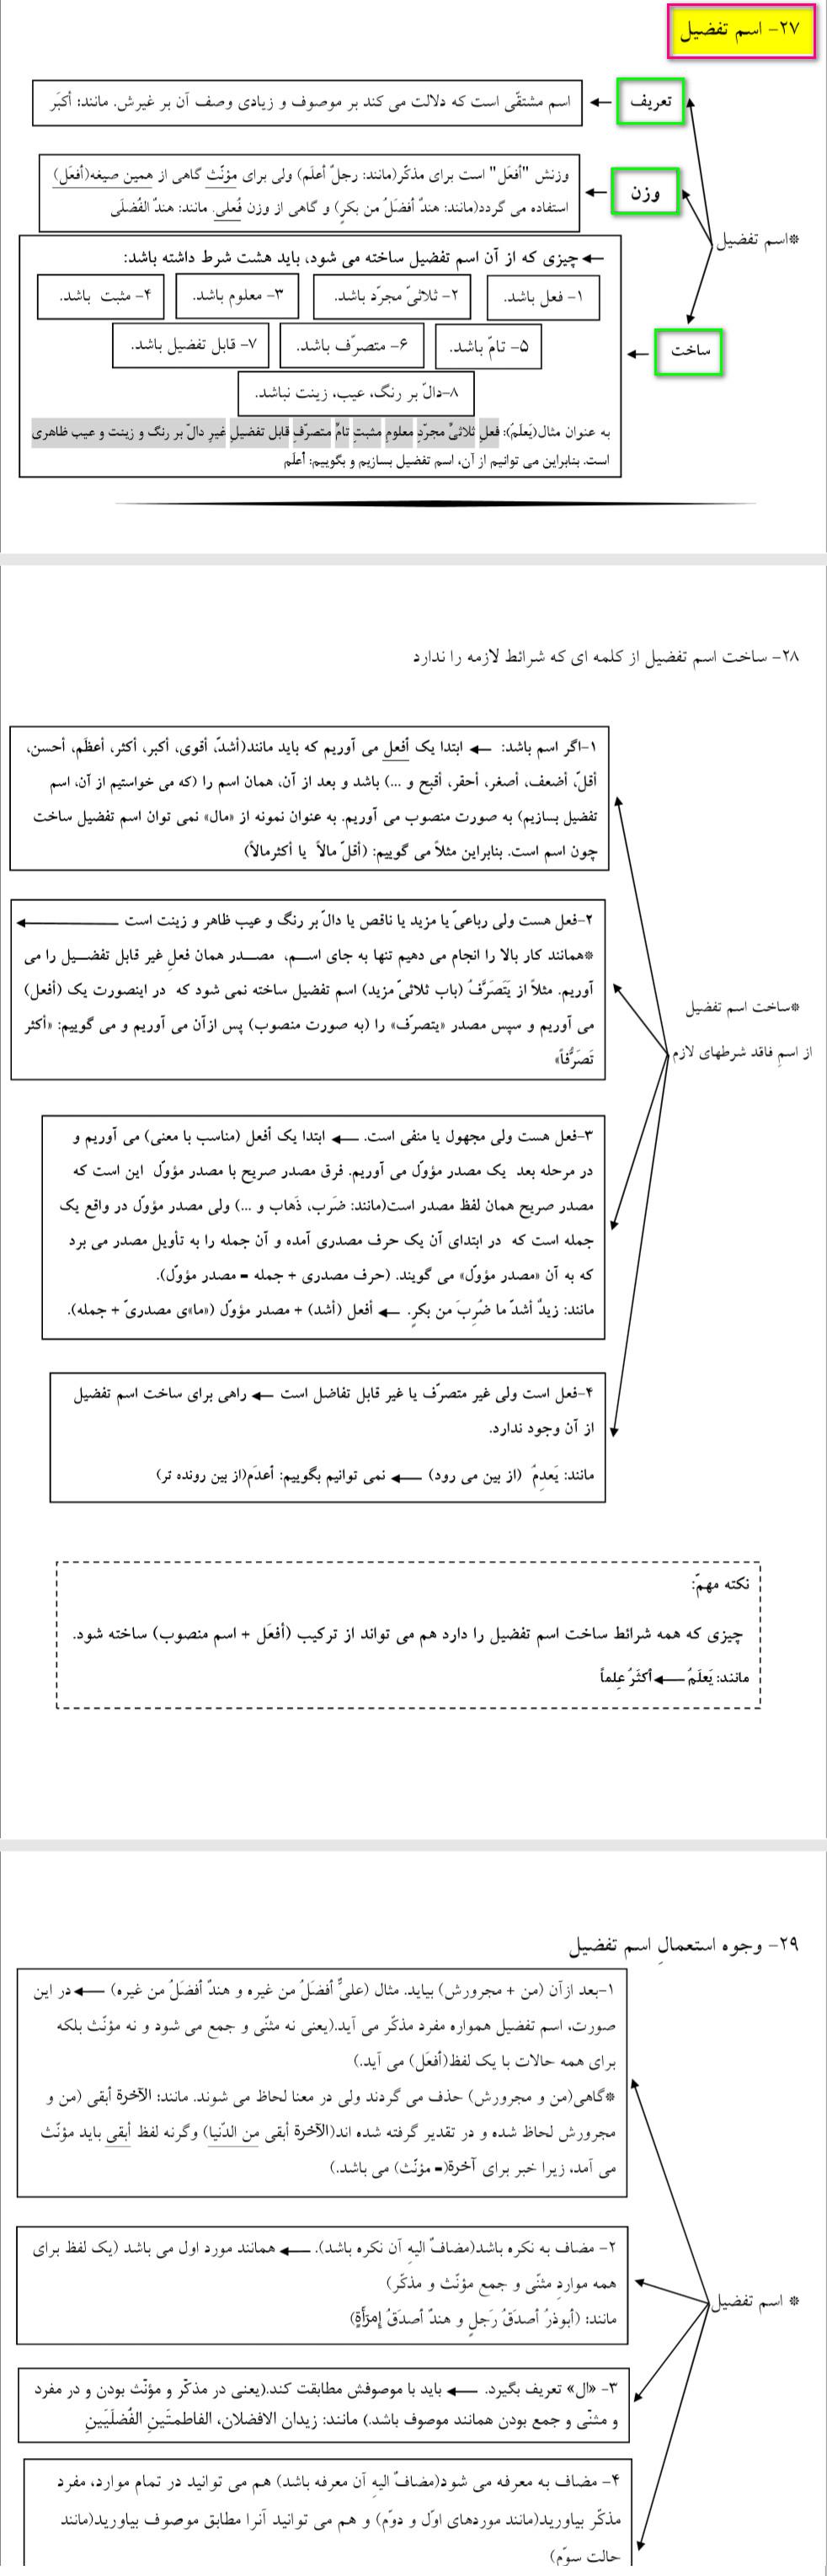 http://s9.picofile.com/file/8358122500/tafzil.jpg